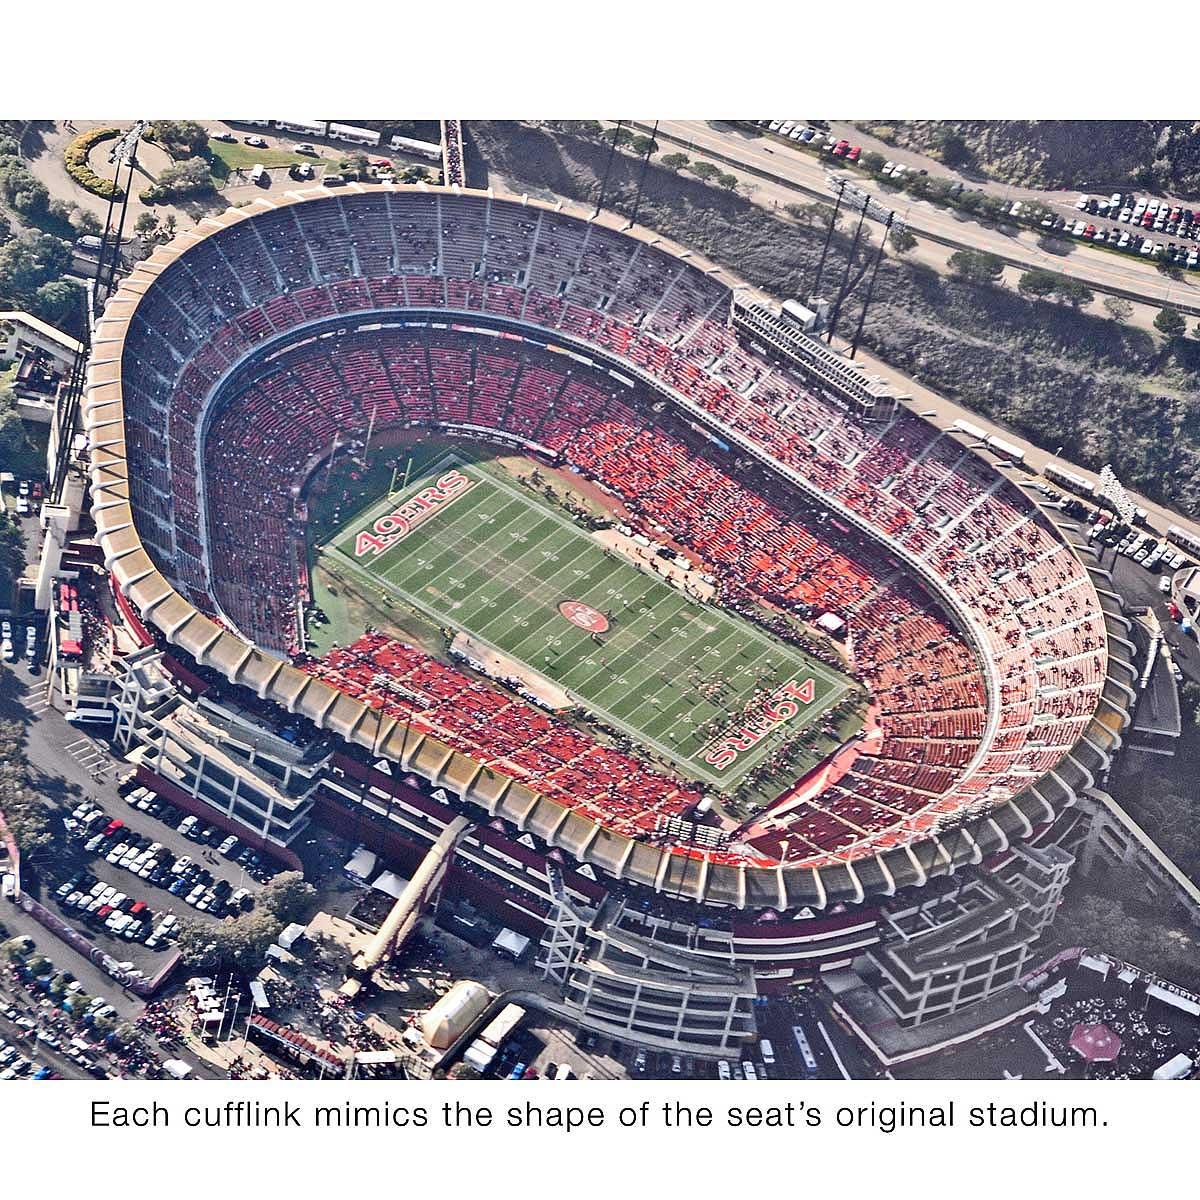 authentic nfl stadium seat cufflinks sports fan gift uncommongoods